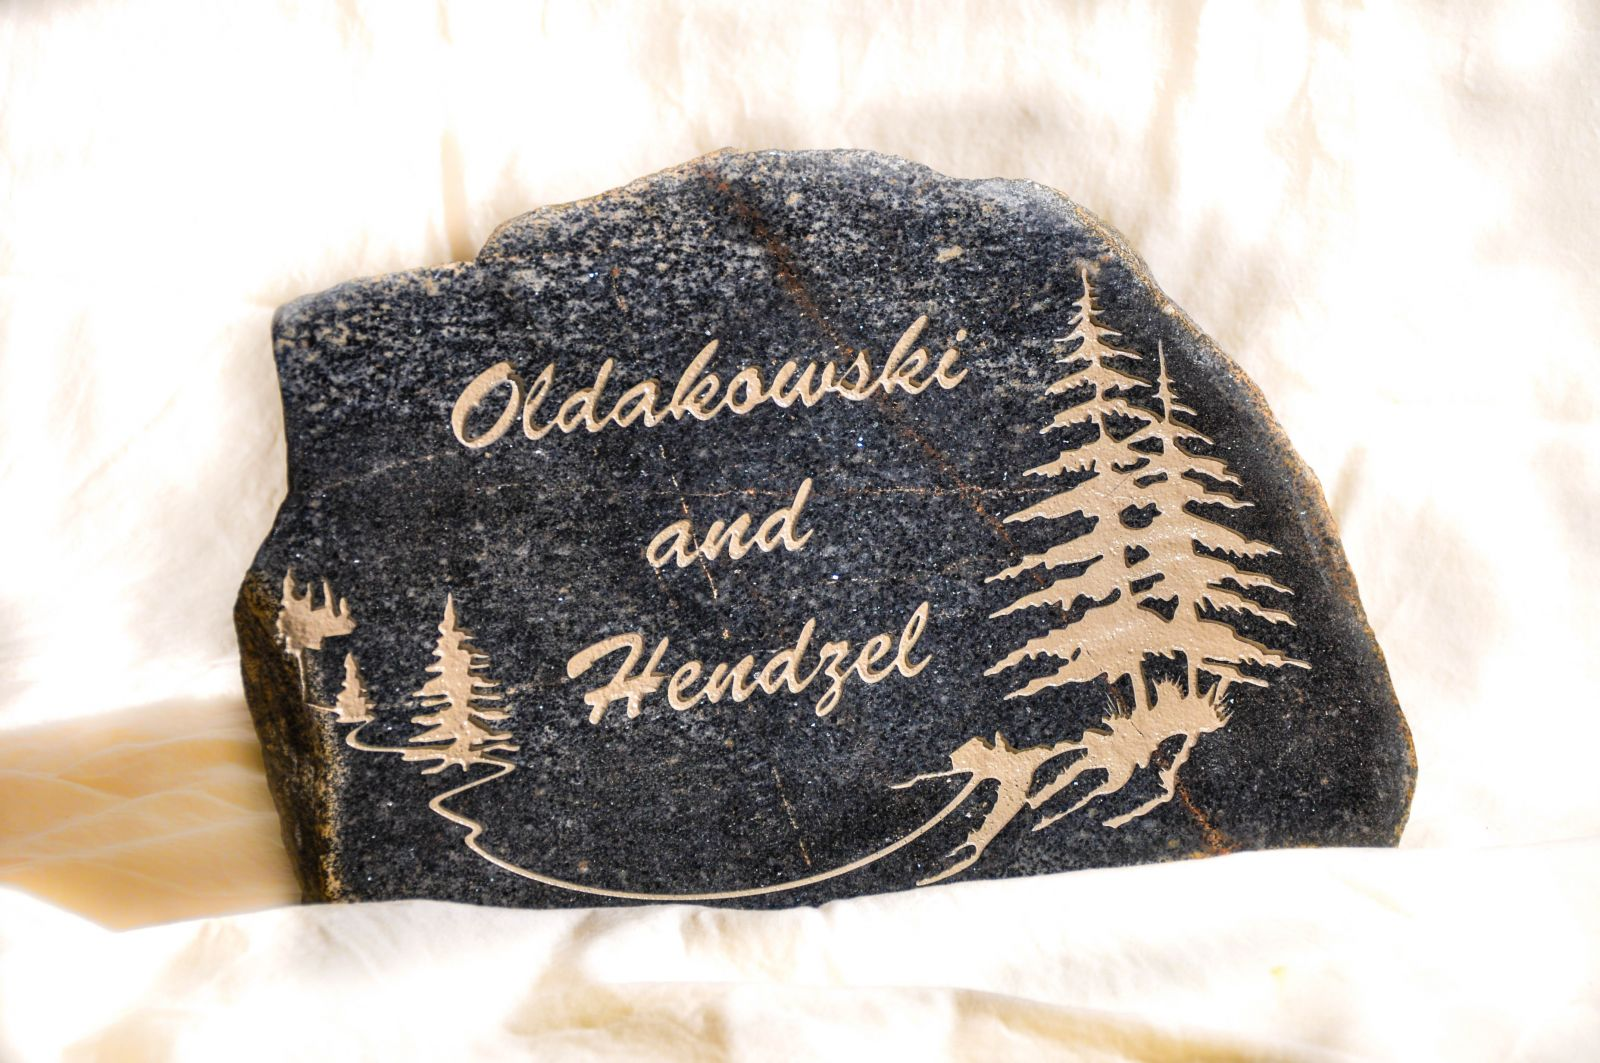 Sandblast etched stone